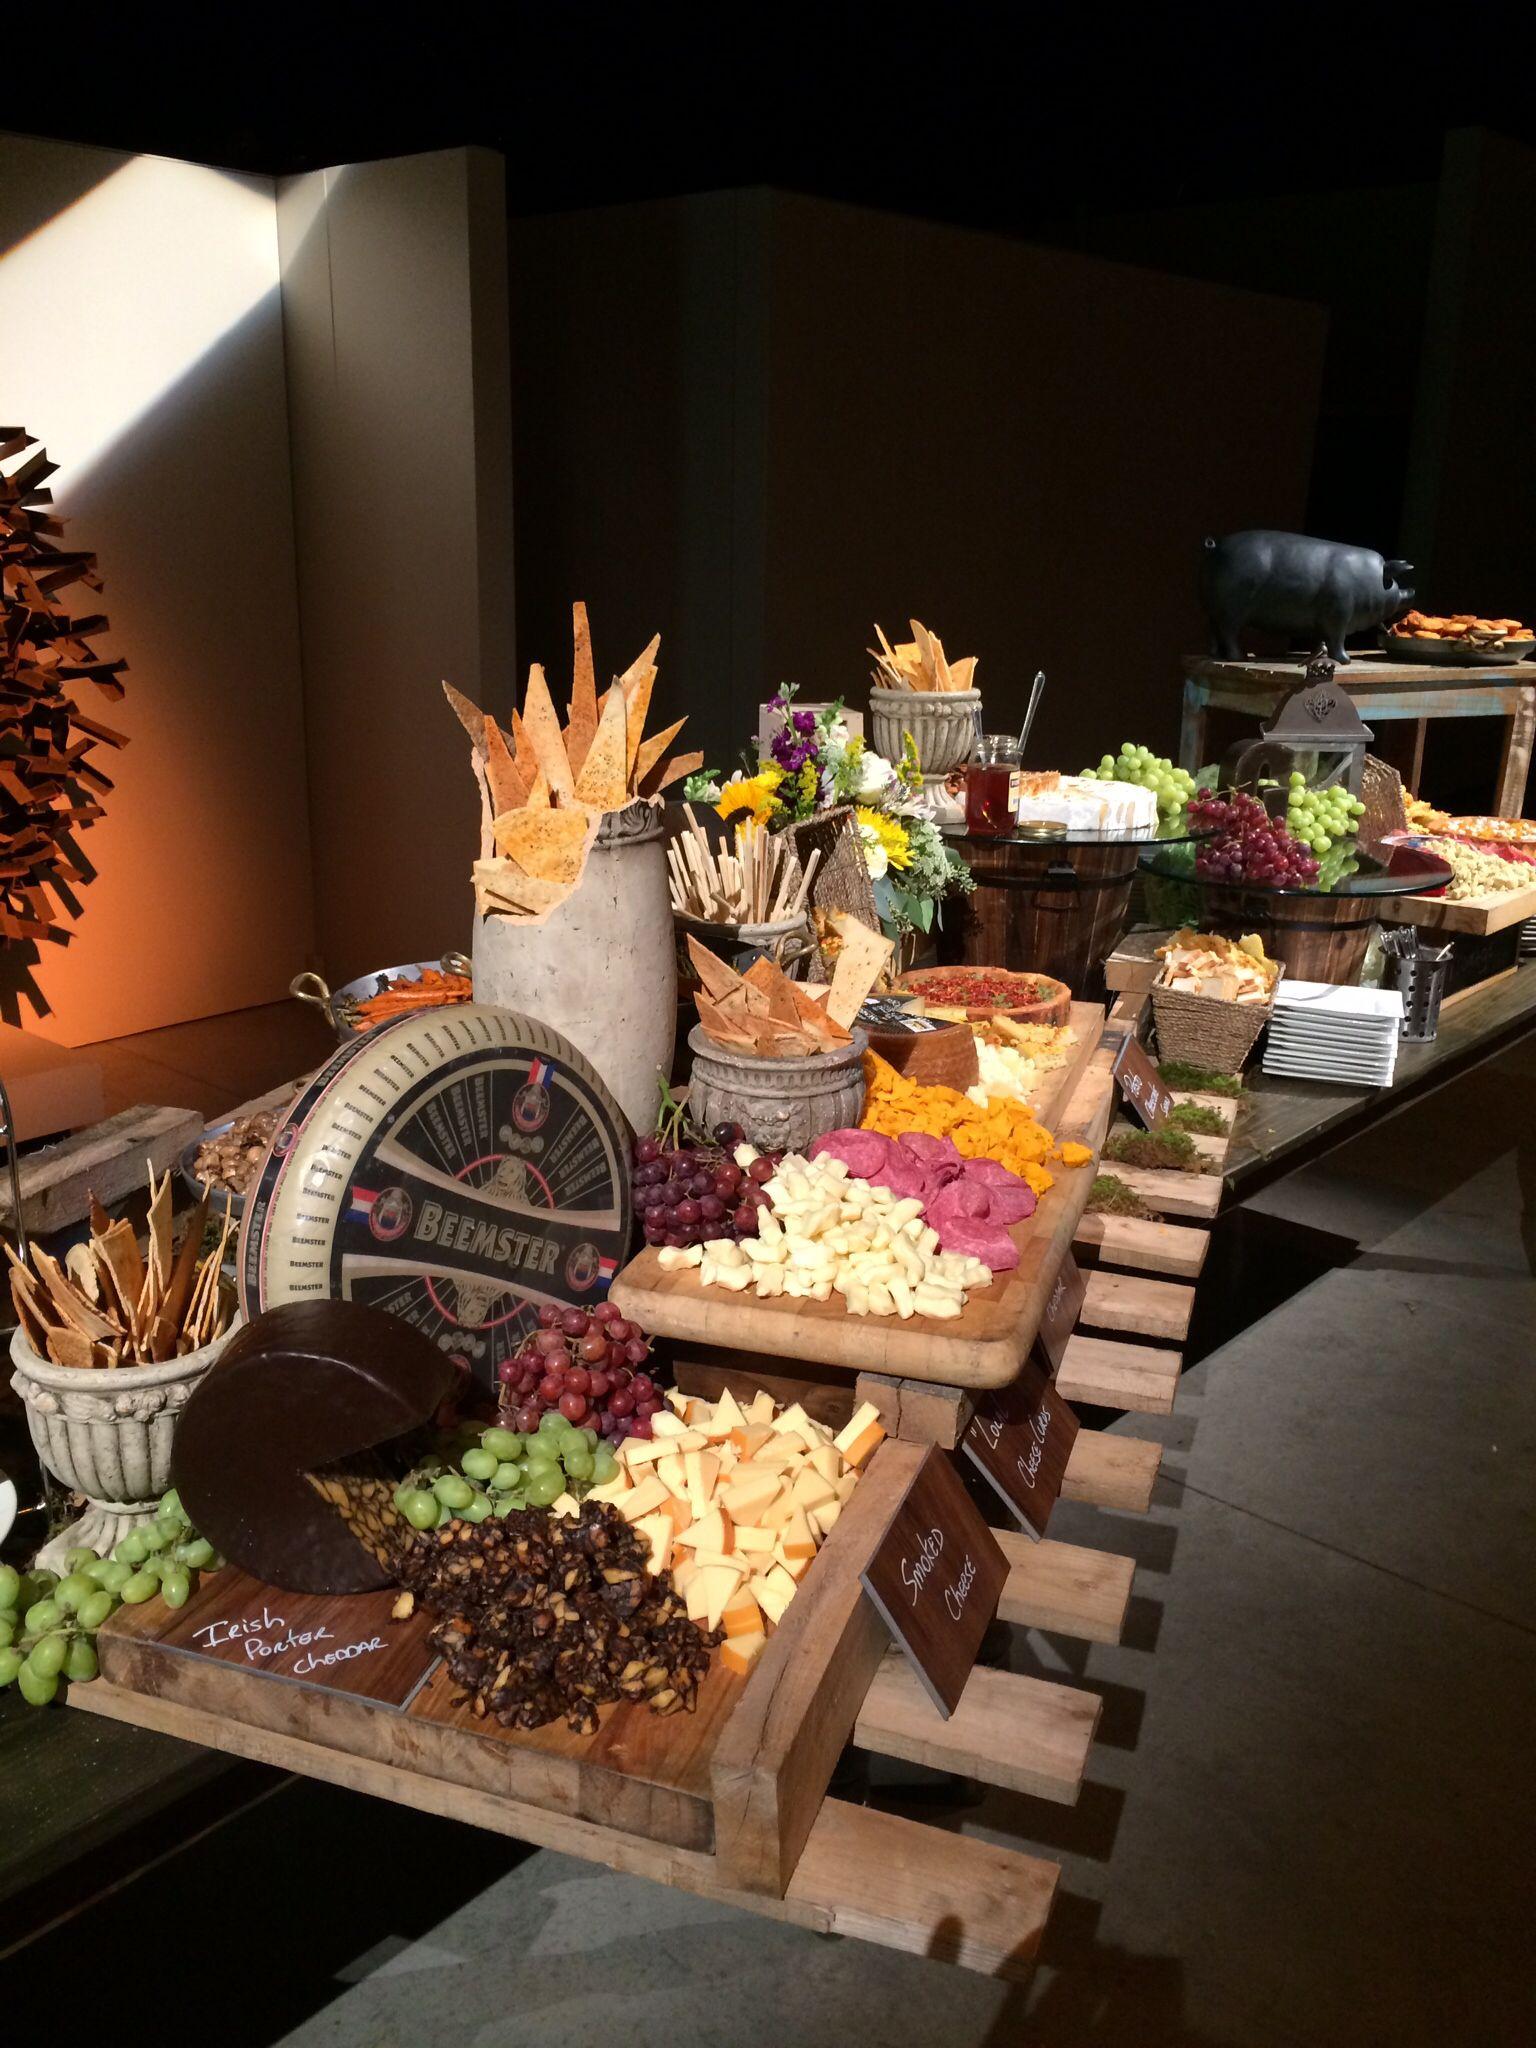 Pallet for buffet decor cheese board essen pinterest for Dekoration essen